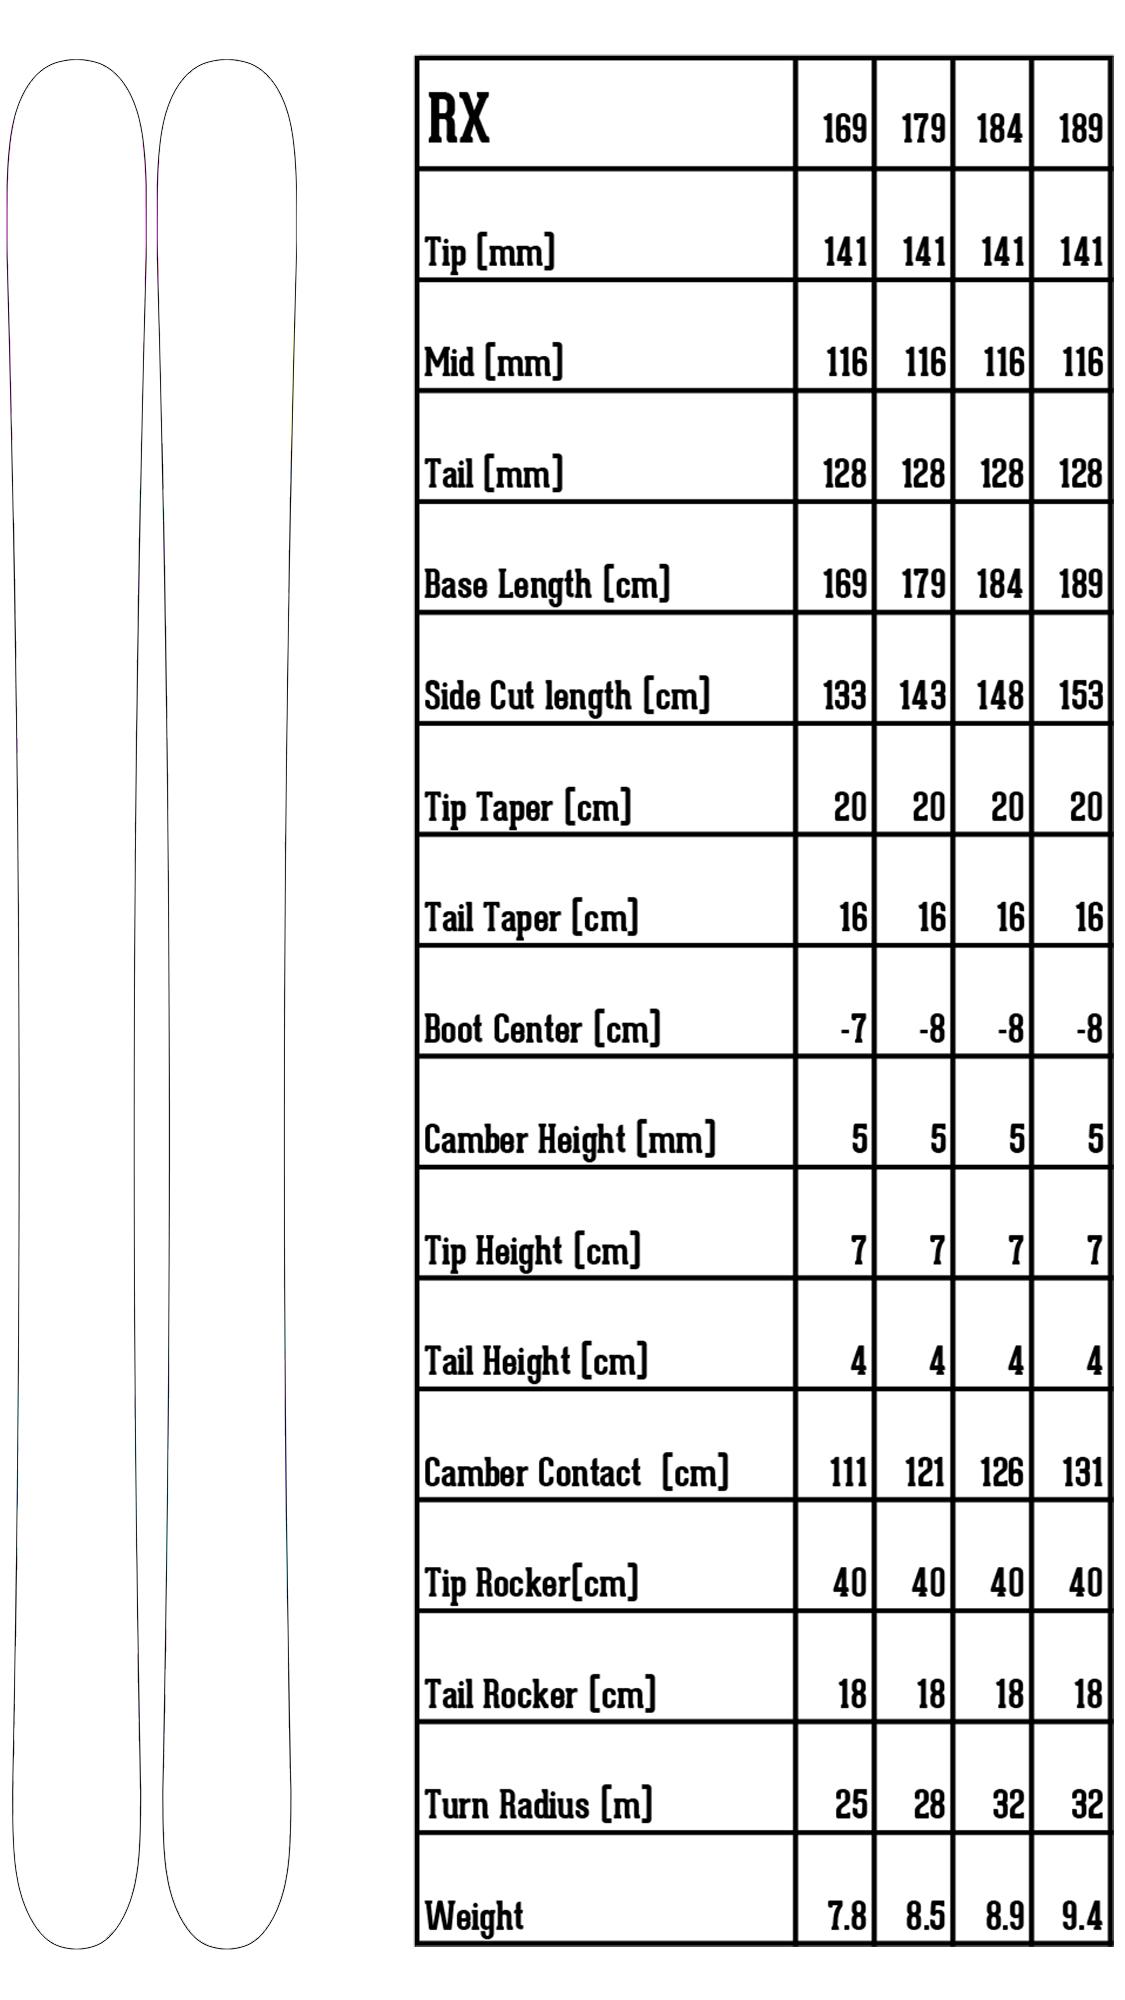 RX ski information sheet rocker camber tip tail height weight